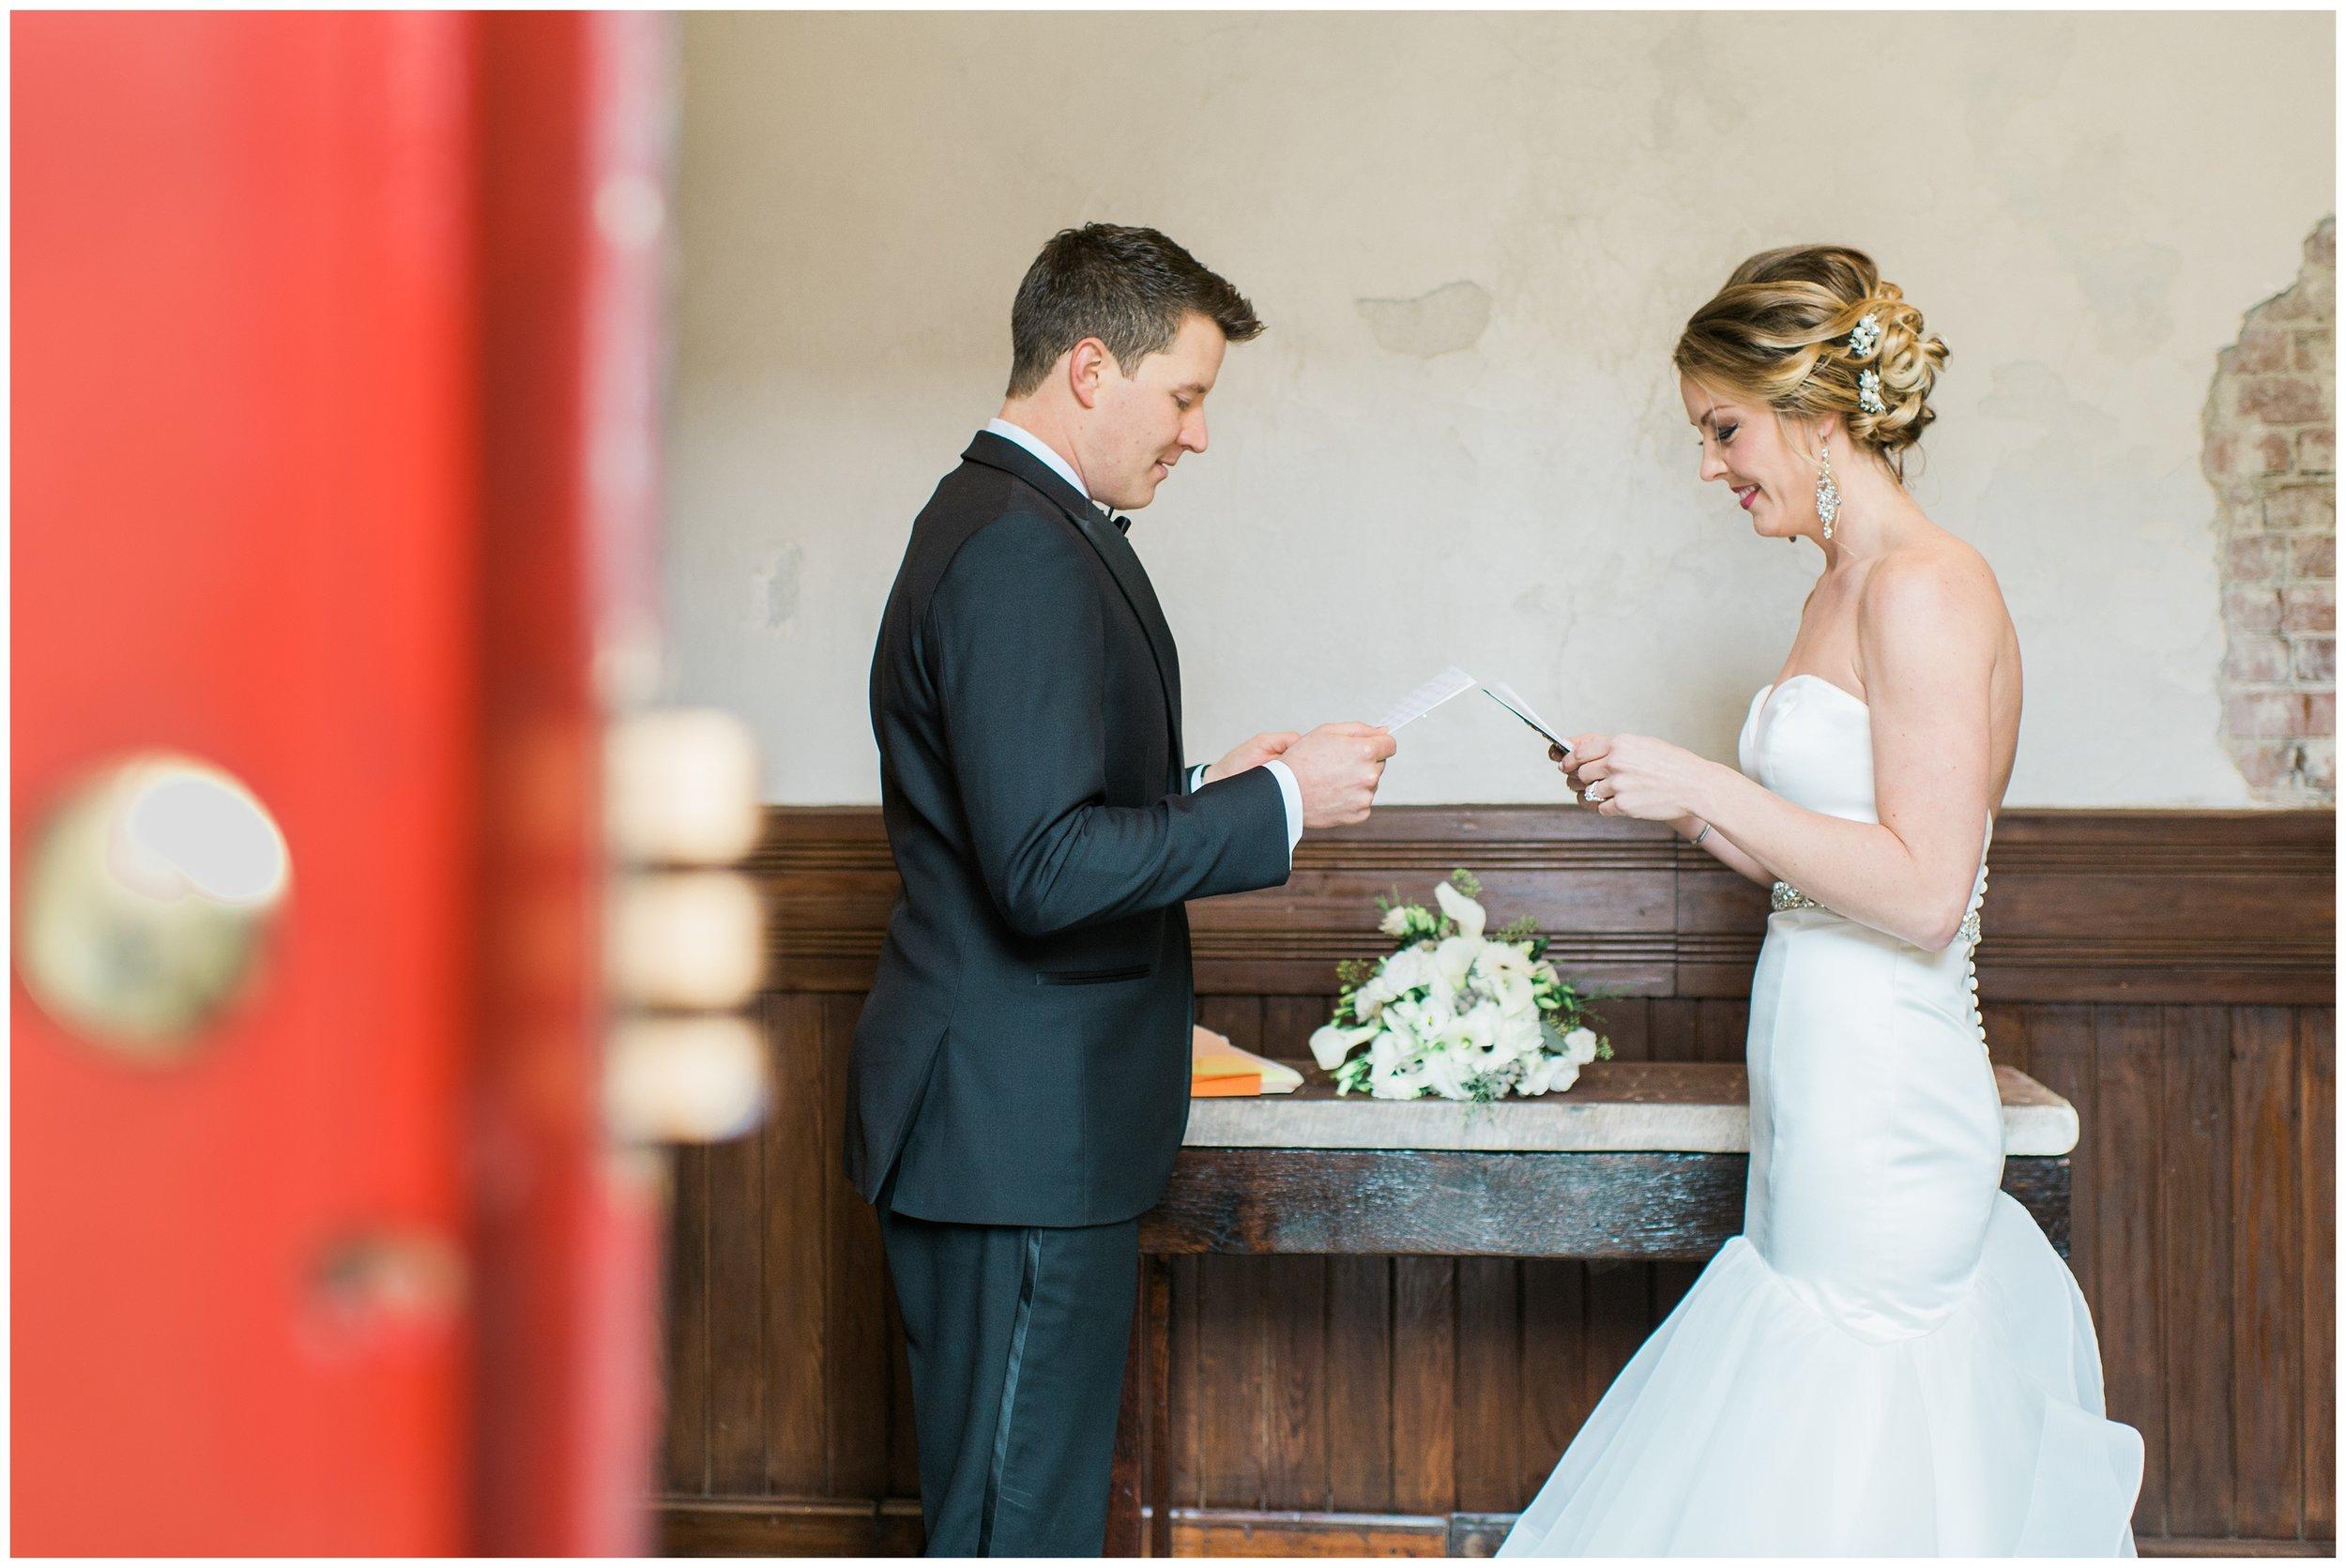 Rebecca_Bridges_Photography_Indianapolis_Wedding_Photographer_5796.jpg